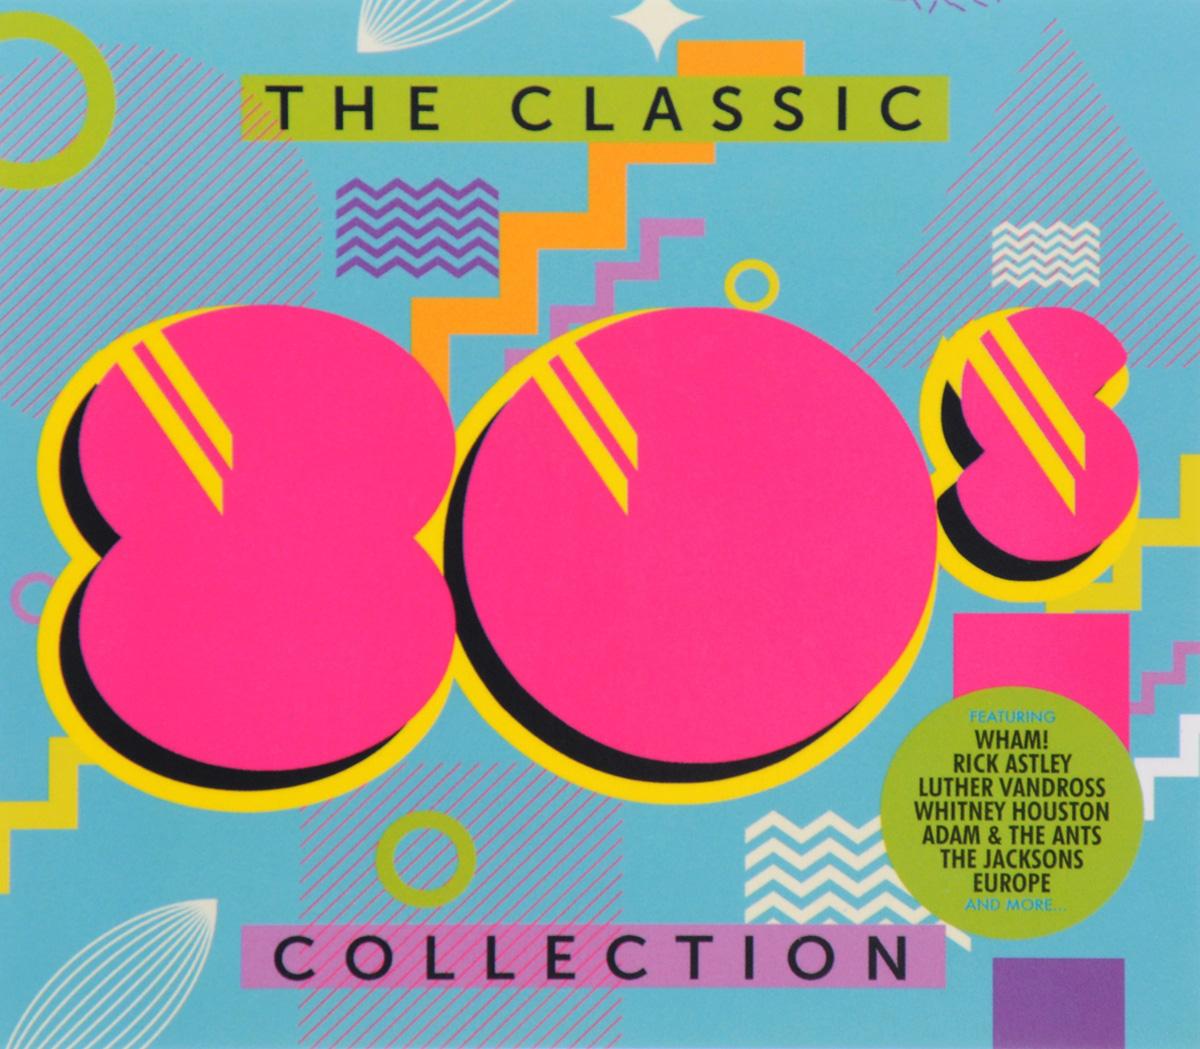 The Jacksons,The Four Tops,KC & The Sunshine Band,Глория Эстэфан,Элис Купер,Soul Survivors,Run-DMC,Europe,Journey,Долли Партон,Bucks Fizz,Bow Wow Wow,Теренс Трент Дарби,Fairground Attraction The Classic 80s Collection (3 CD) the four tops soul legends four tops